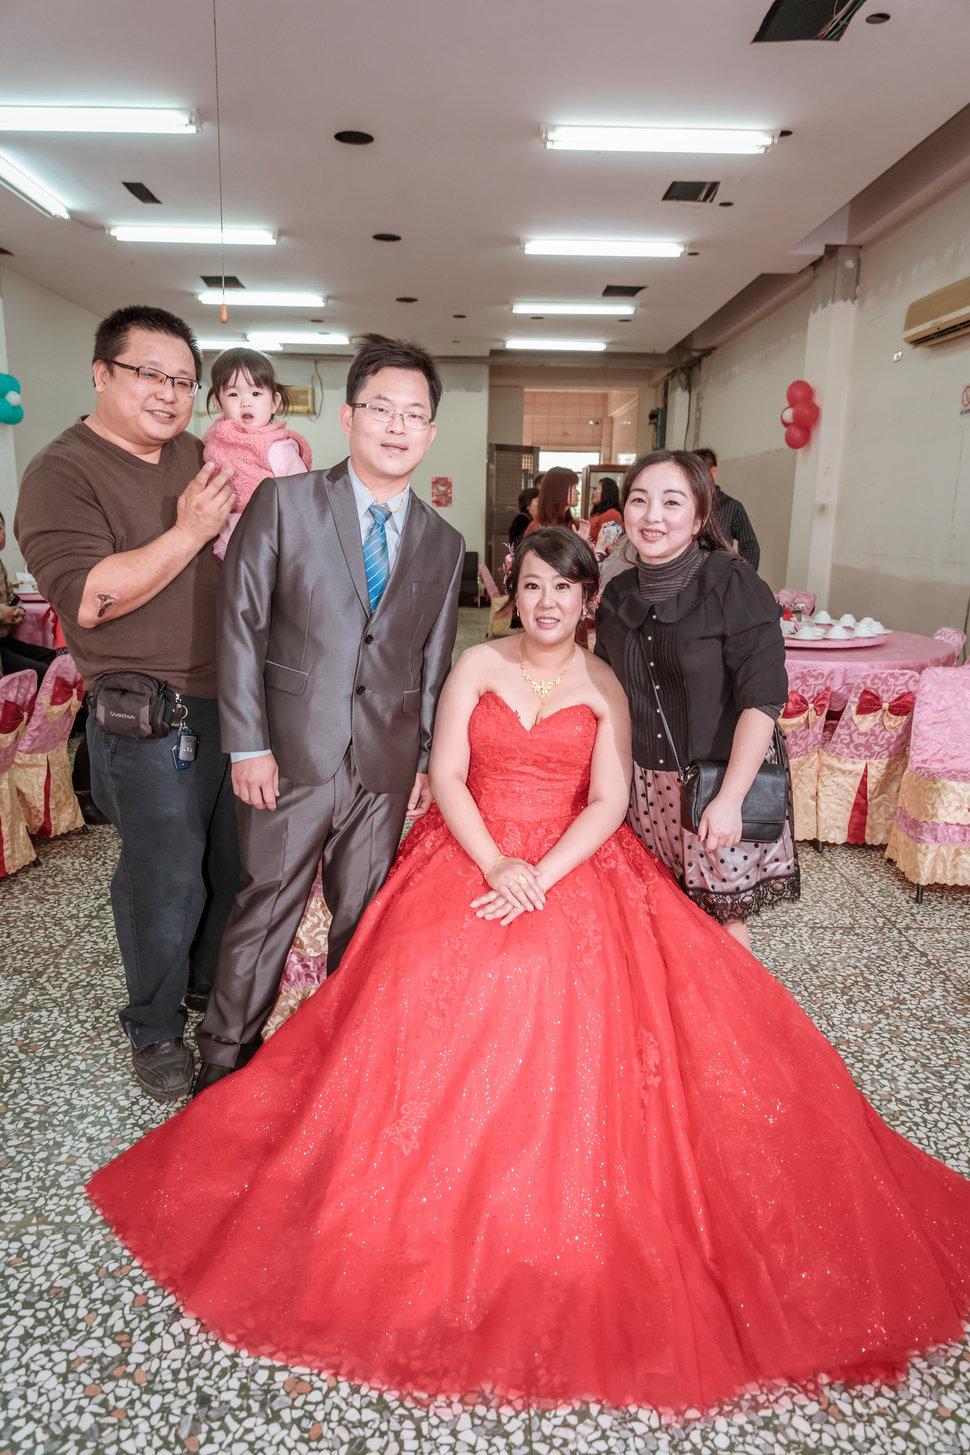 5D4_0425 - Promaker婚禮紀錄攝影團隊婚攝豪哥《結婚吧》